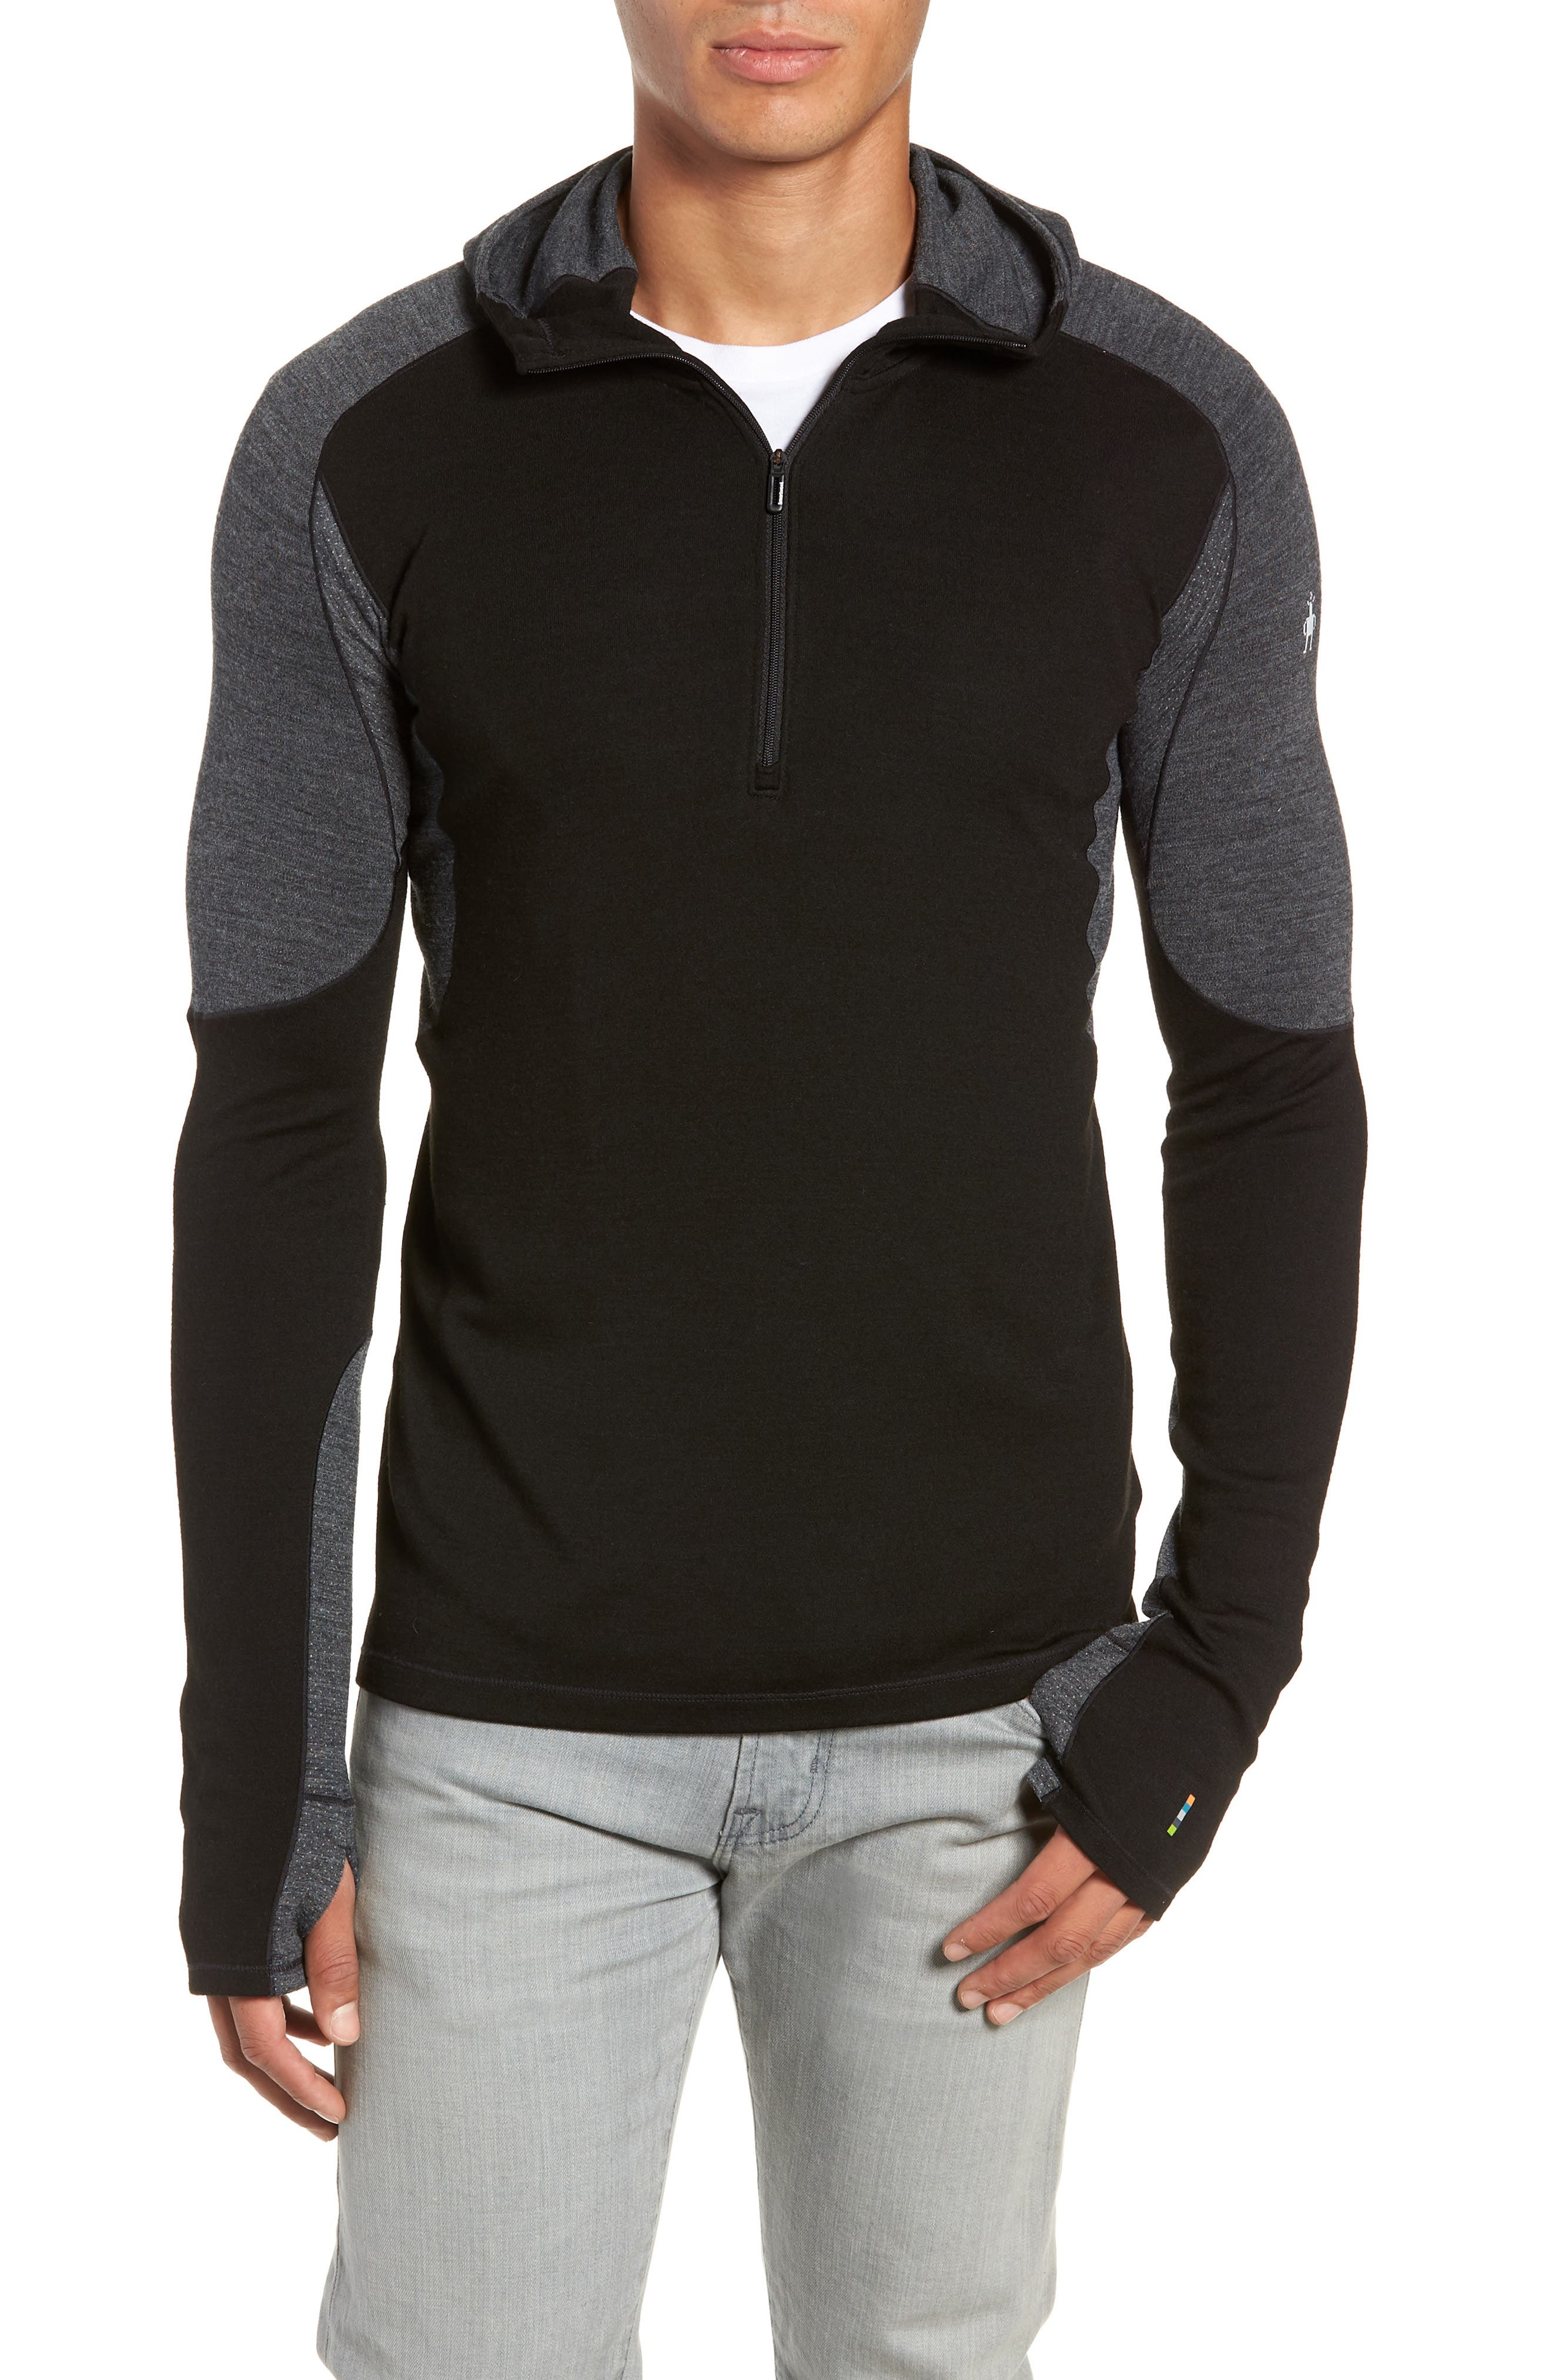 Smartwool Phd Light Merino Wool Blend Hooded Pullover, Black